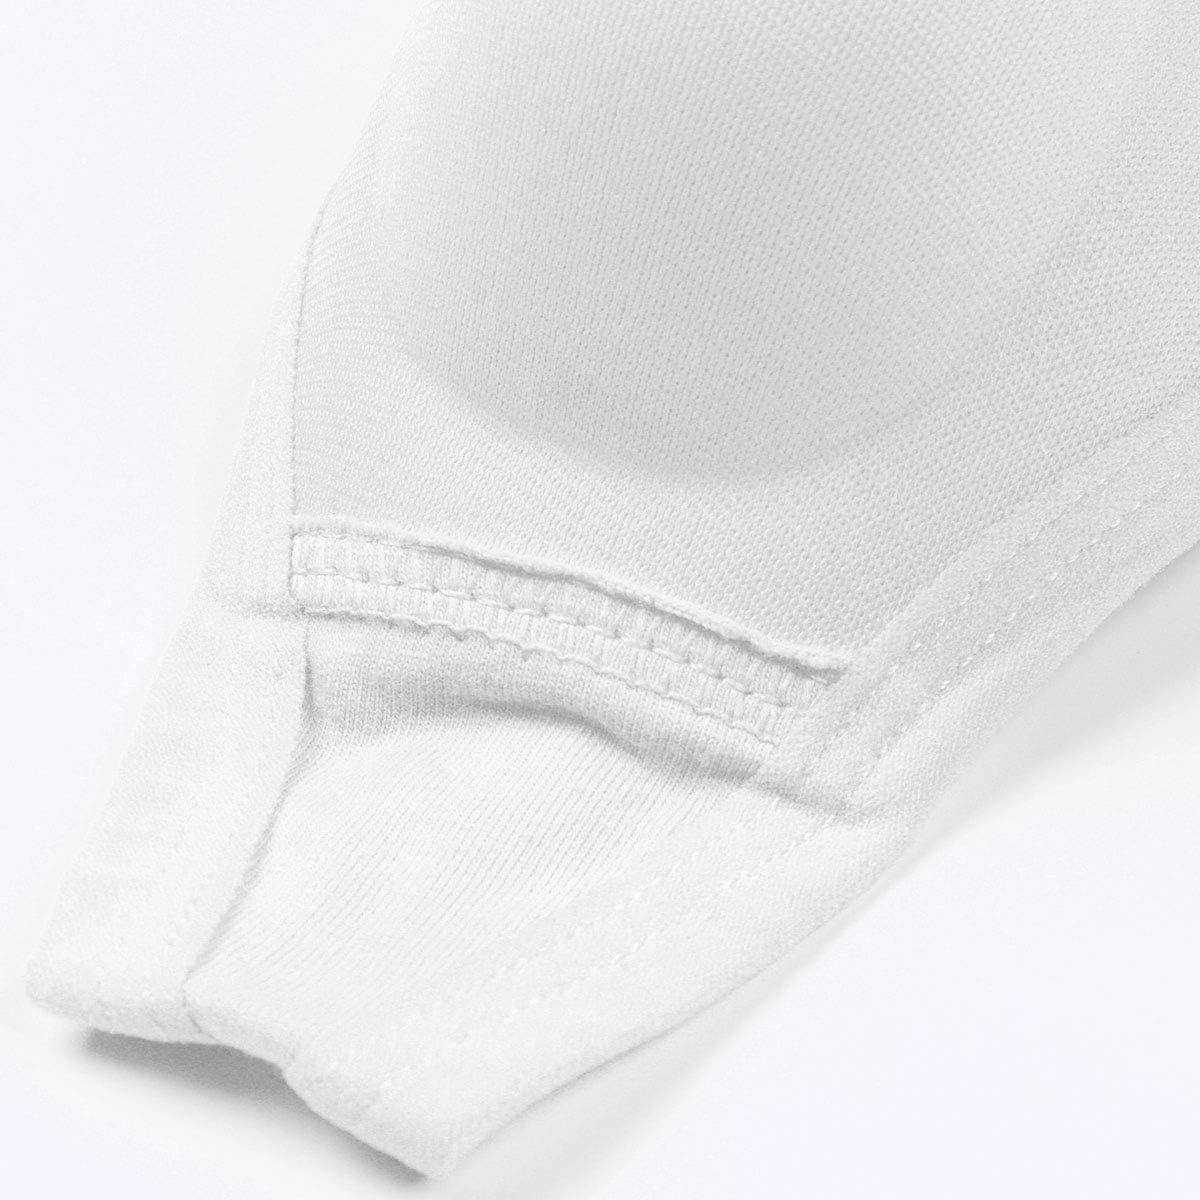 Freebily Mens Lingerie Low Waist Push Up Padded U Shape Sponge Bulge Pouch G-String Thong Underwear